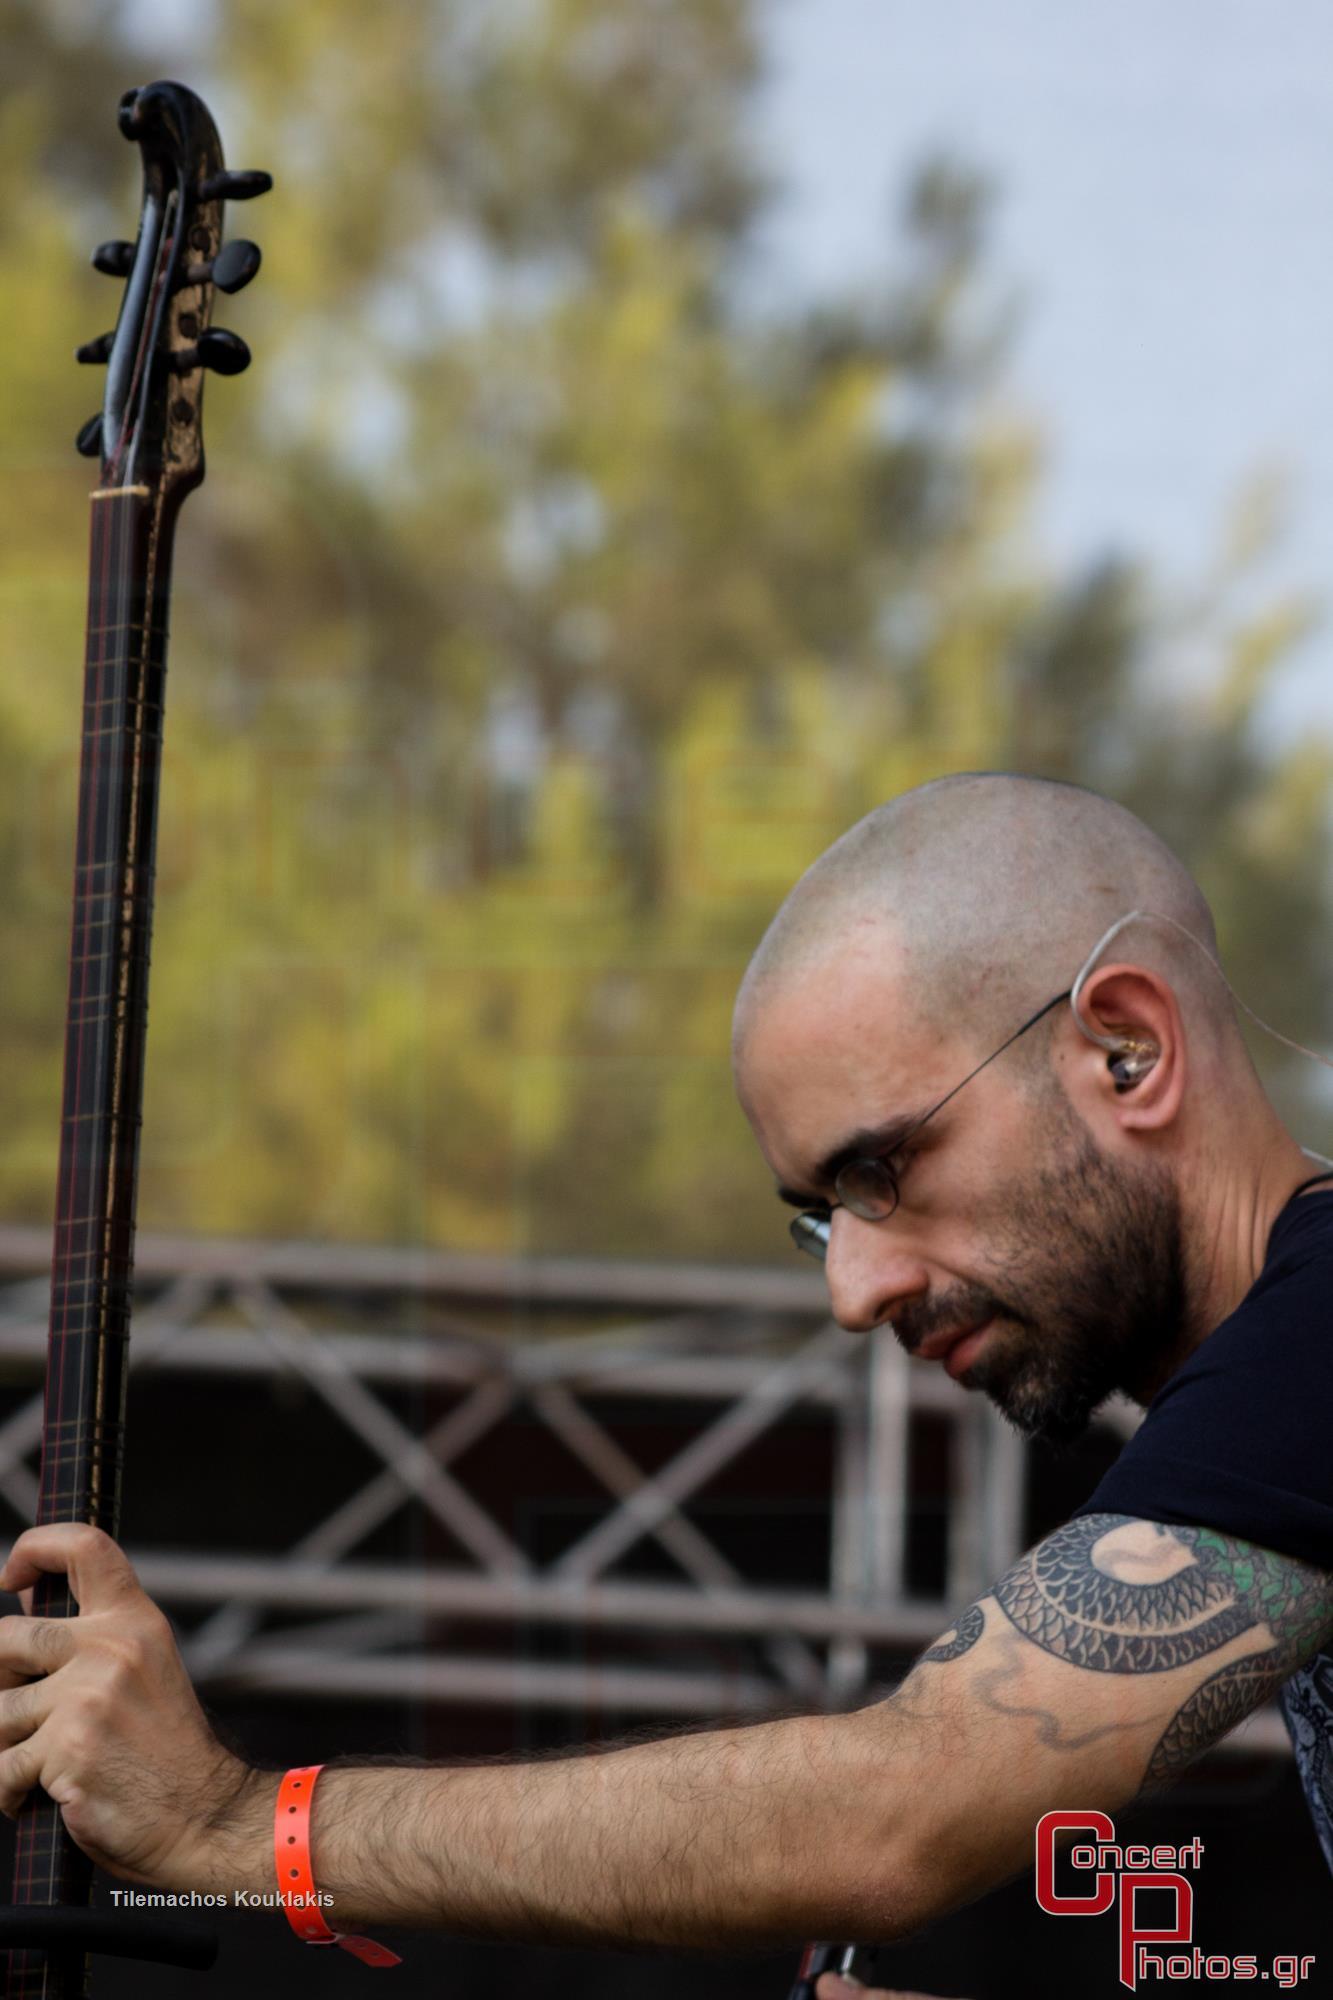 Chaostar-Chaostar photographer: Tilemachos Kouklakis - concertphotos_-0238